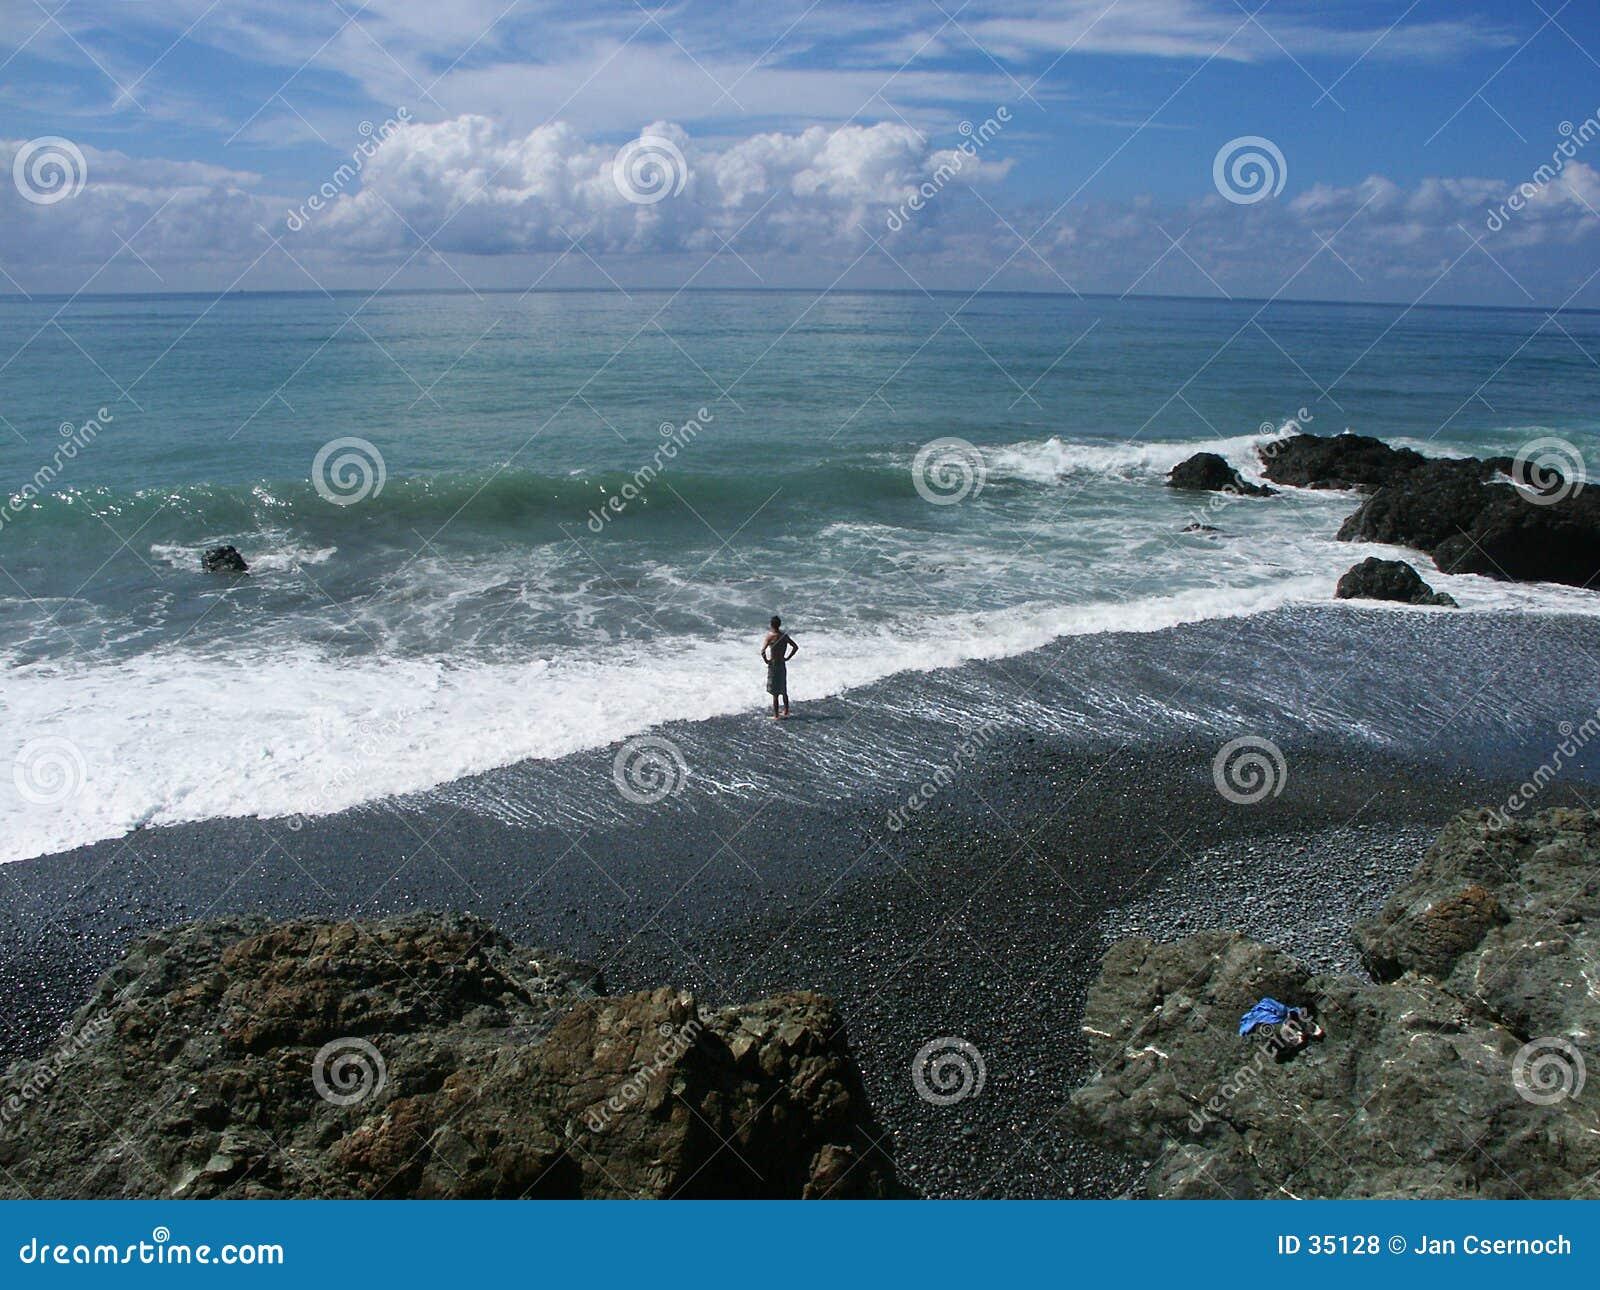 Considering a swim in the ocean